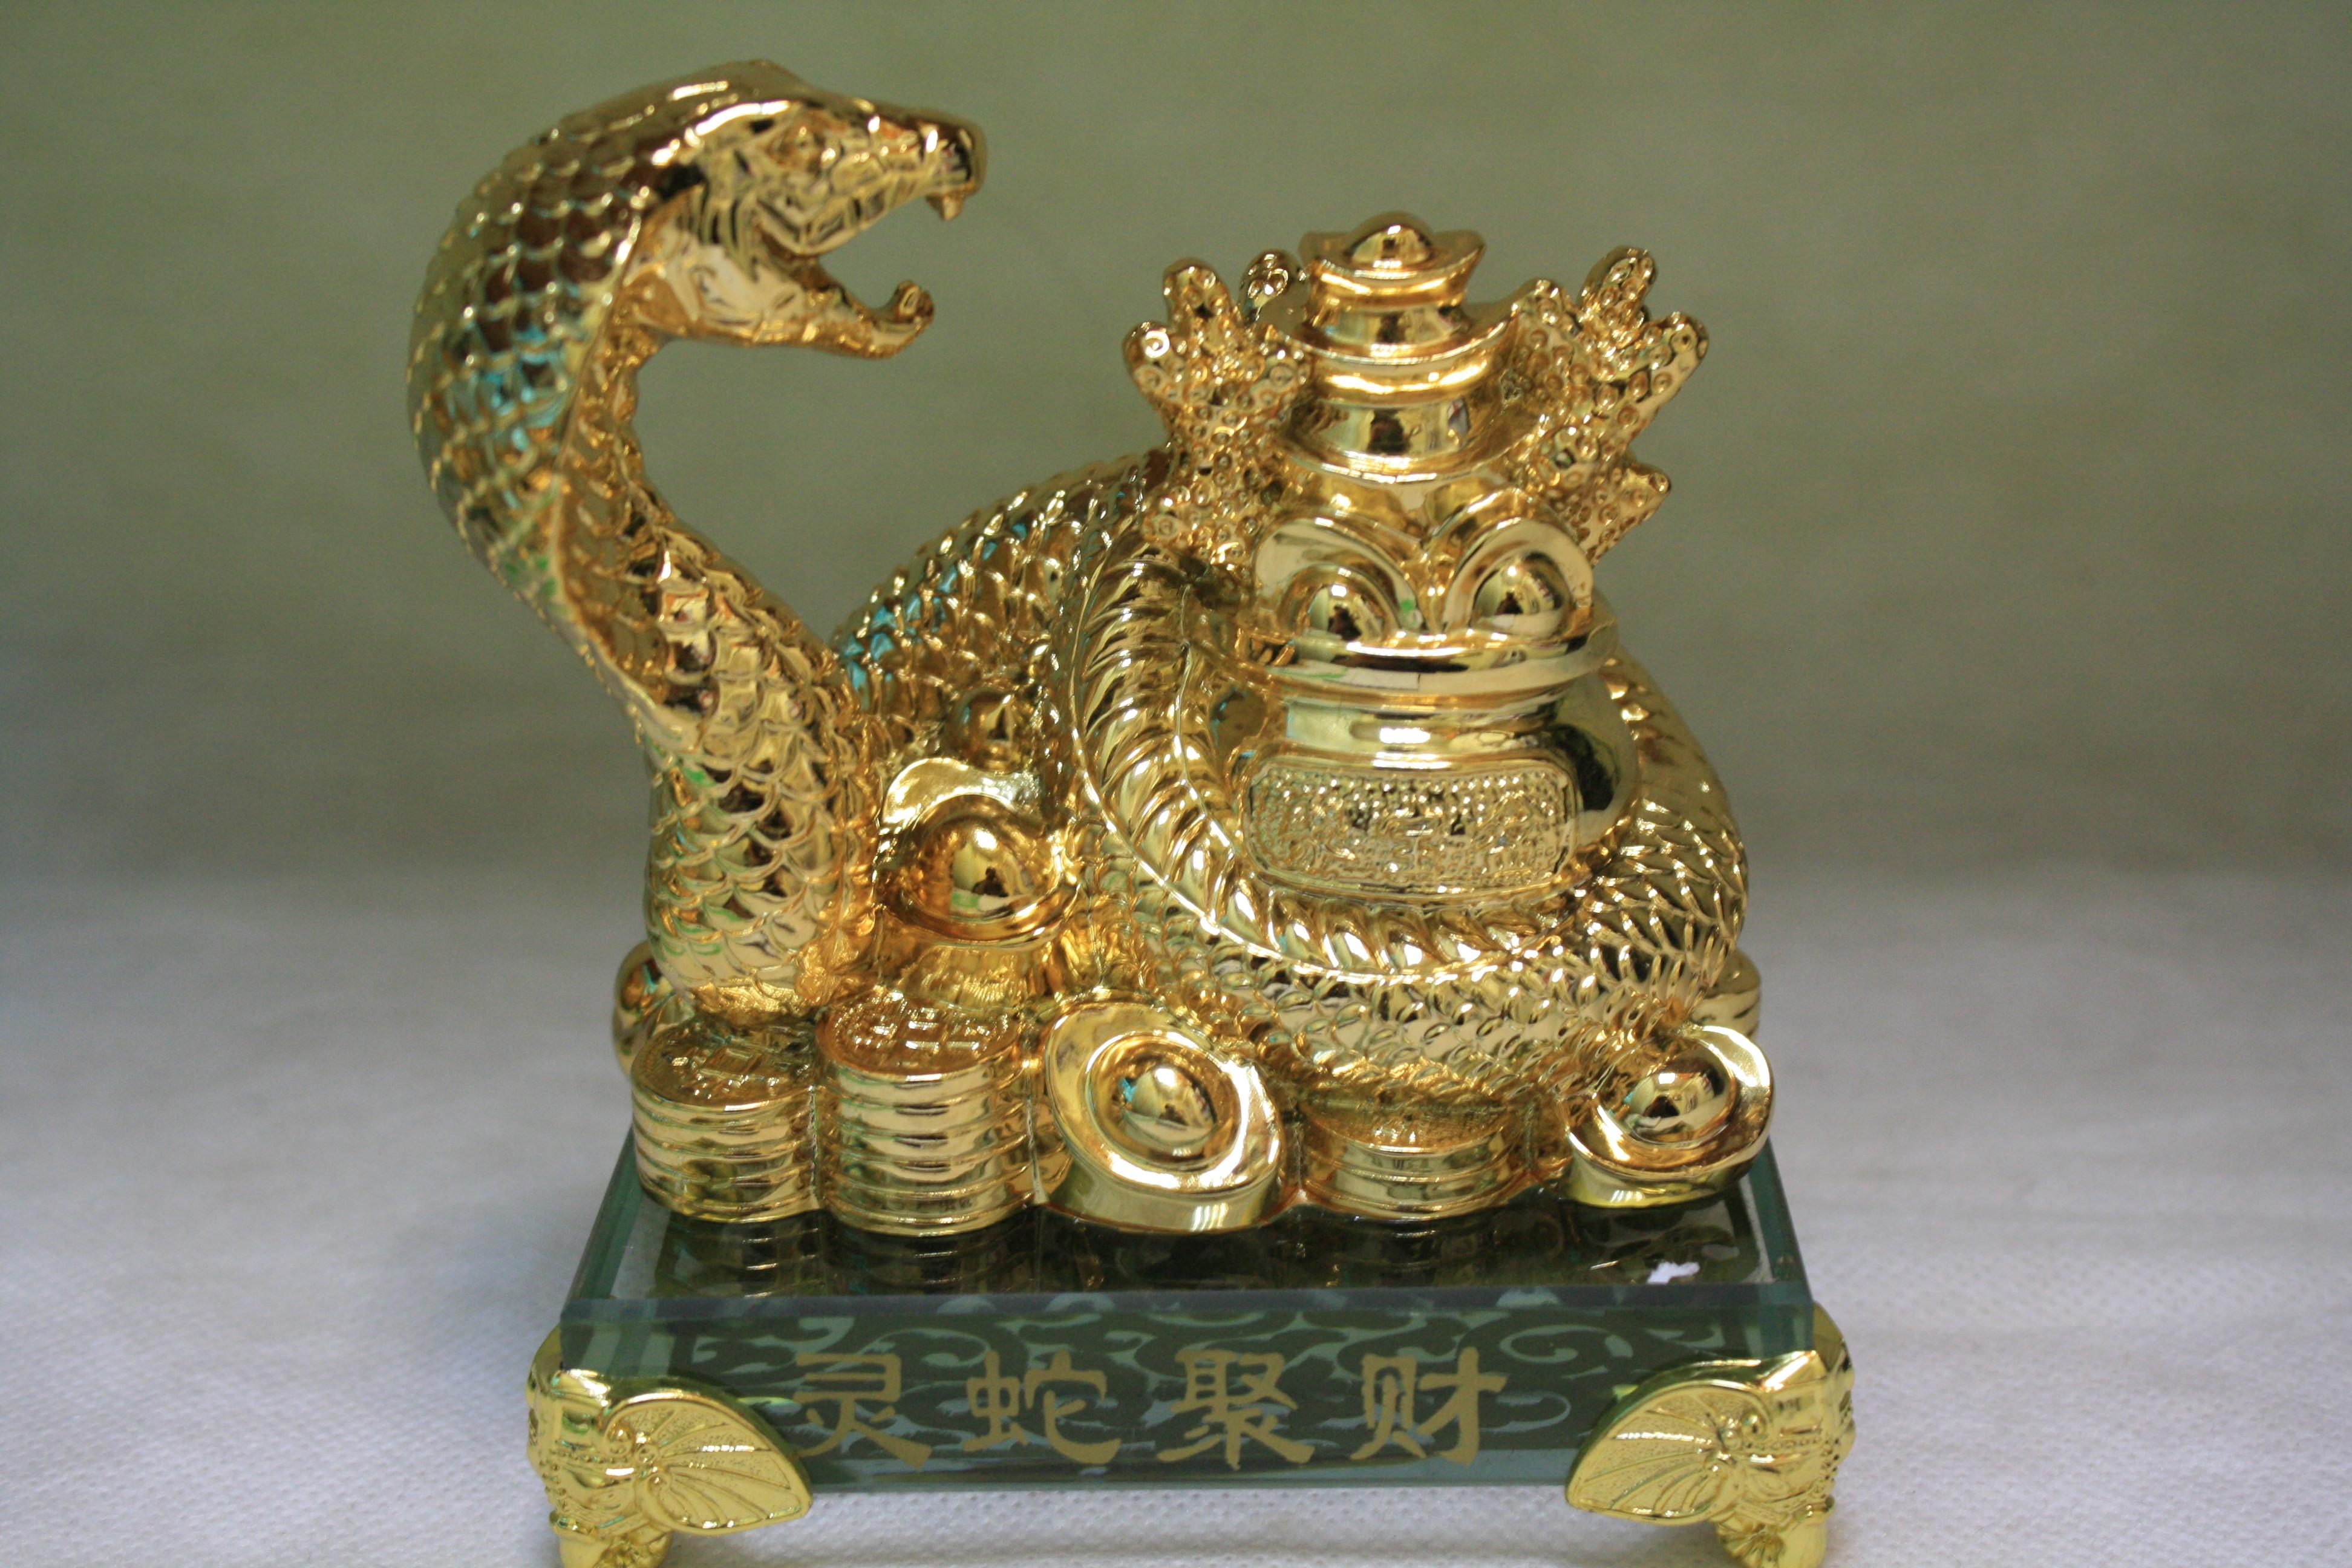 символ богатства - трехногая жаба